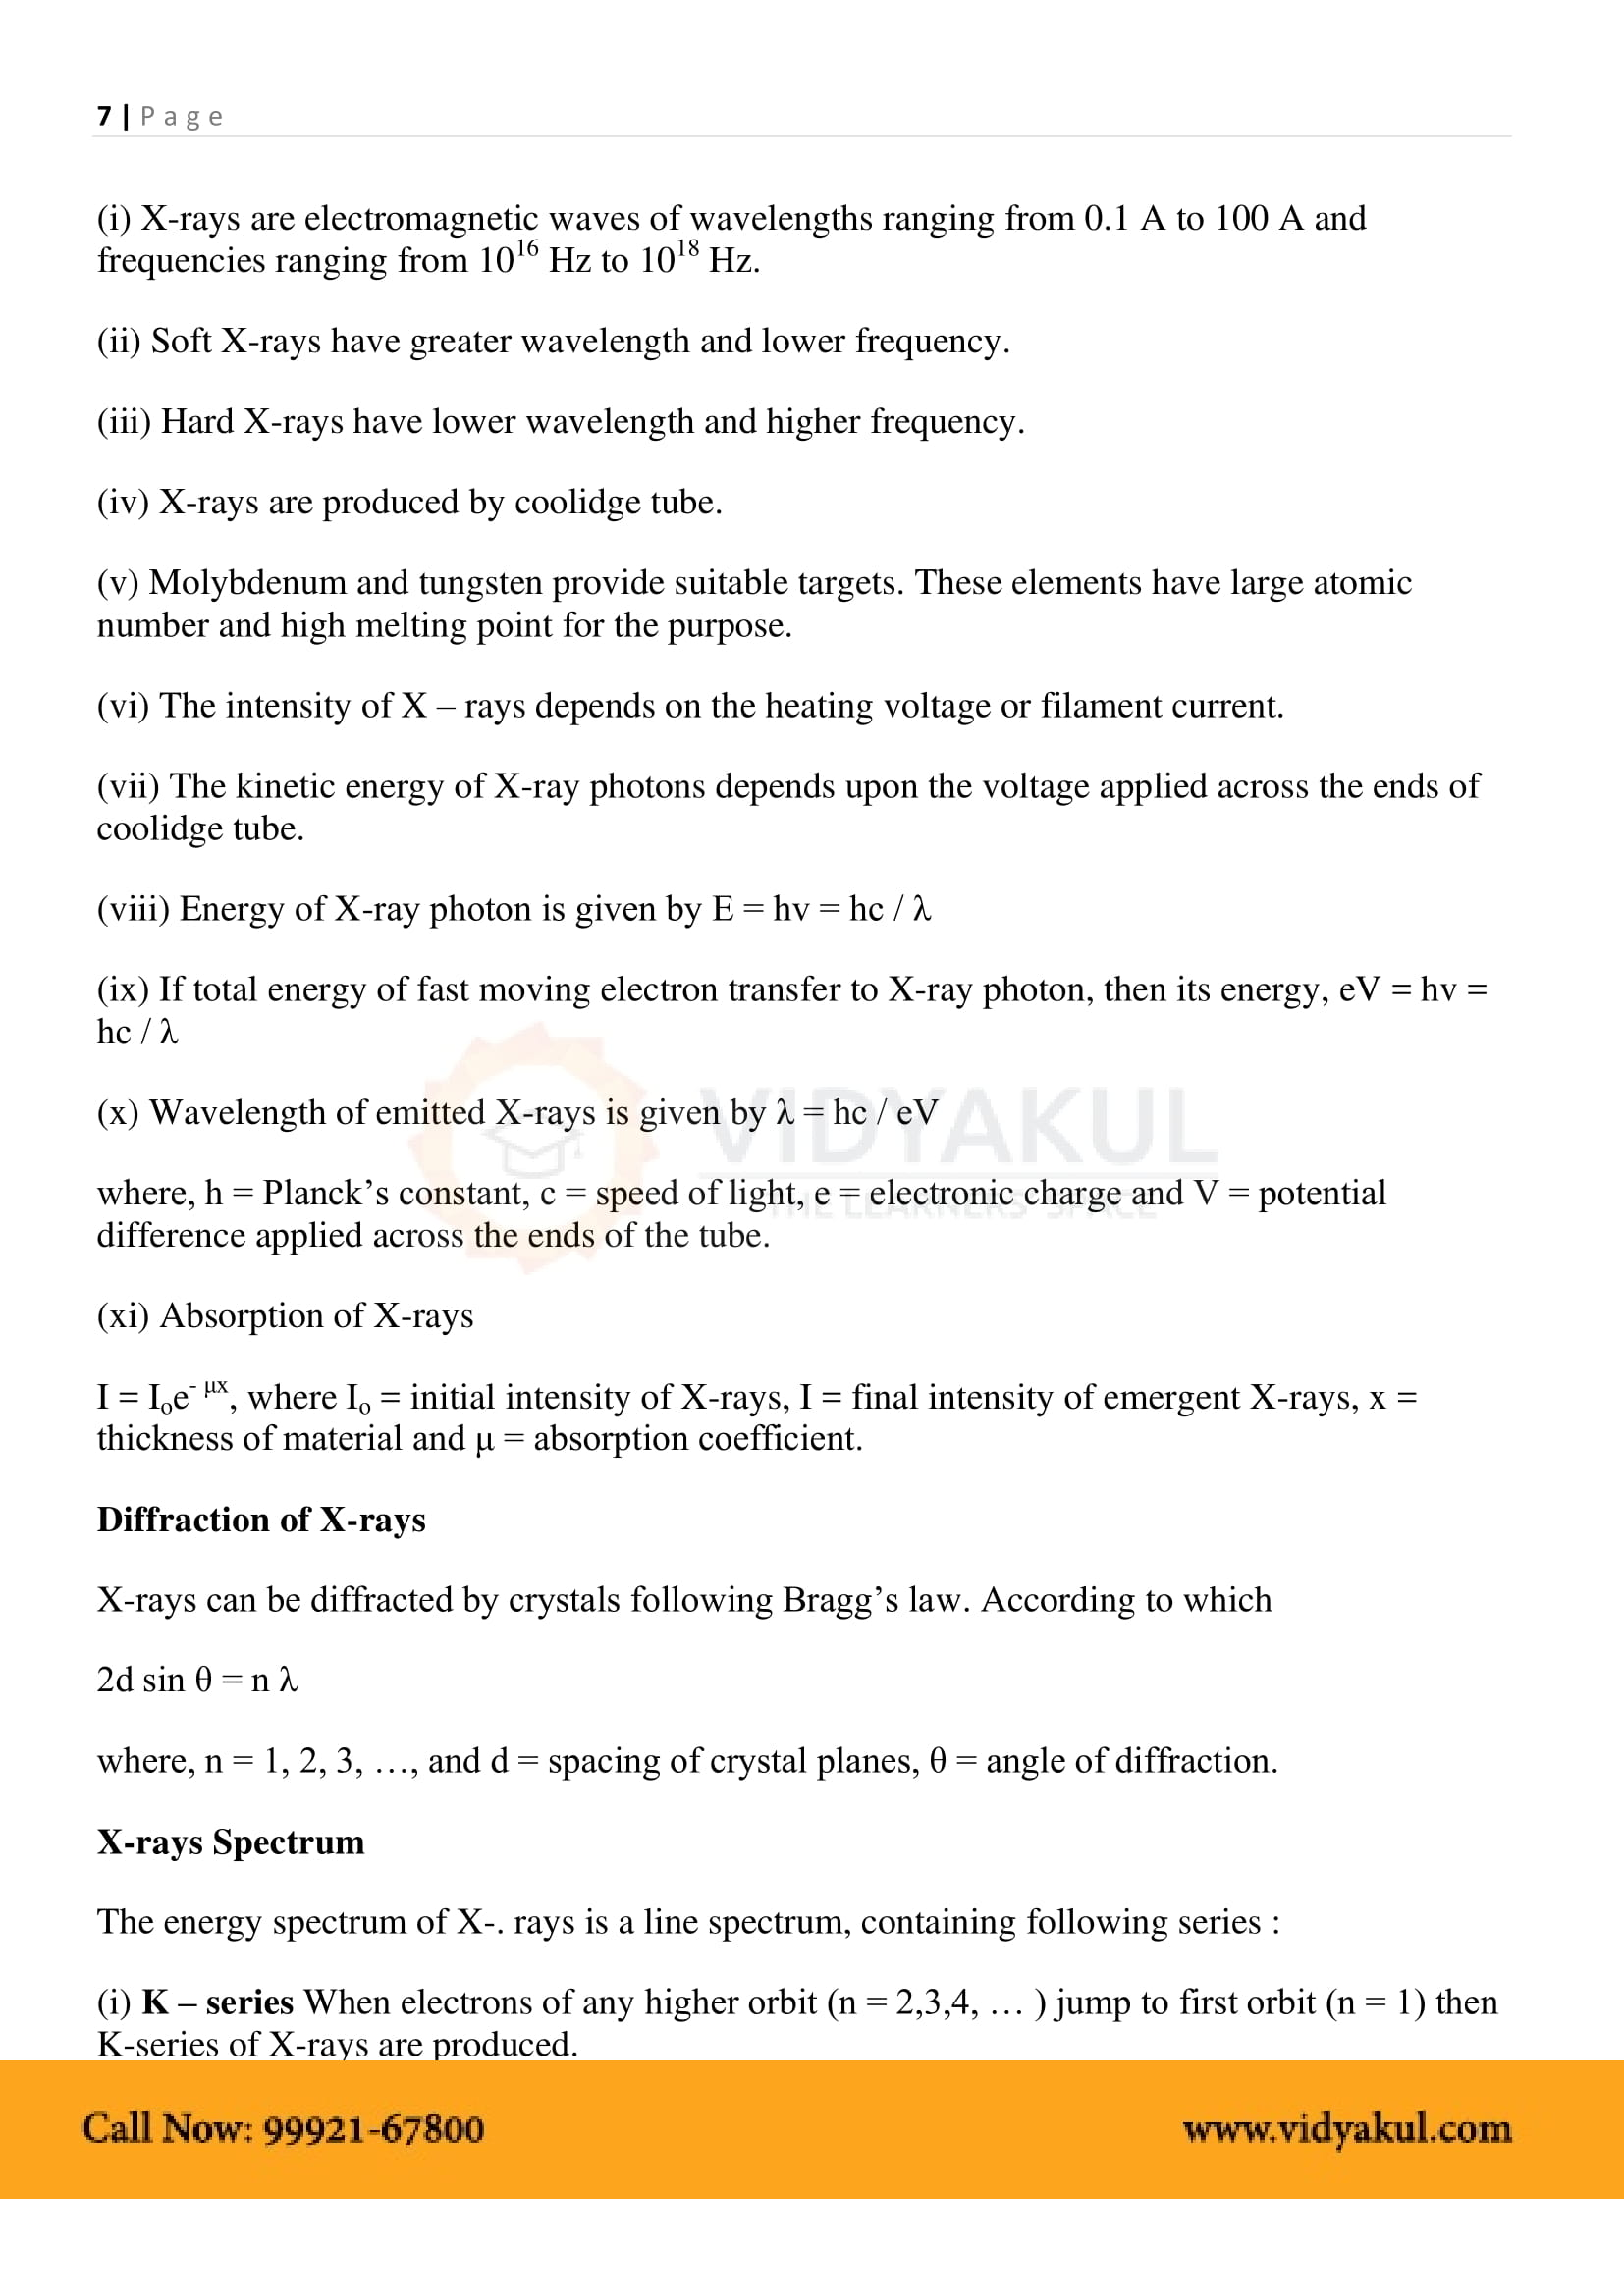 Dual Nature of Radiation and Matter Class 12 Notes | Vidyakul